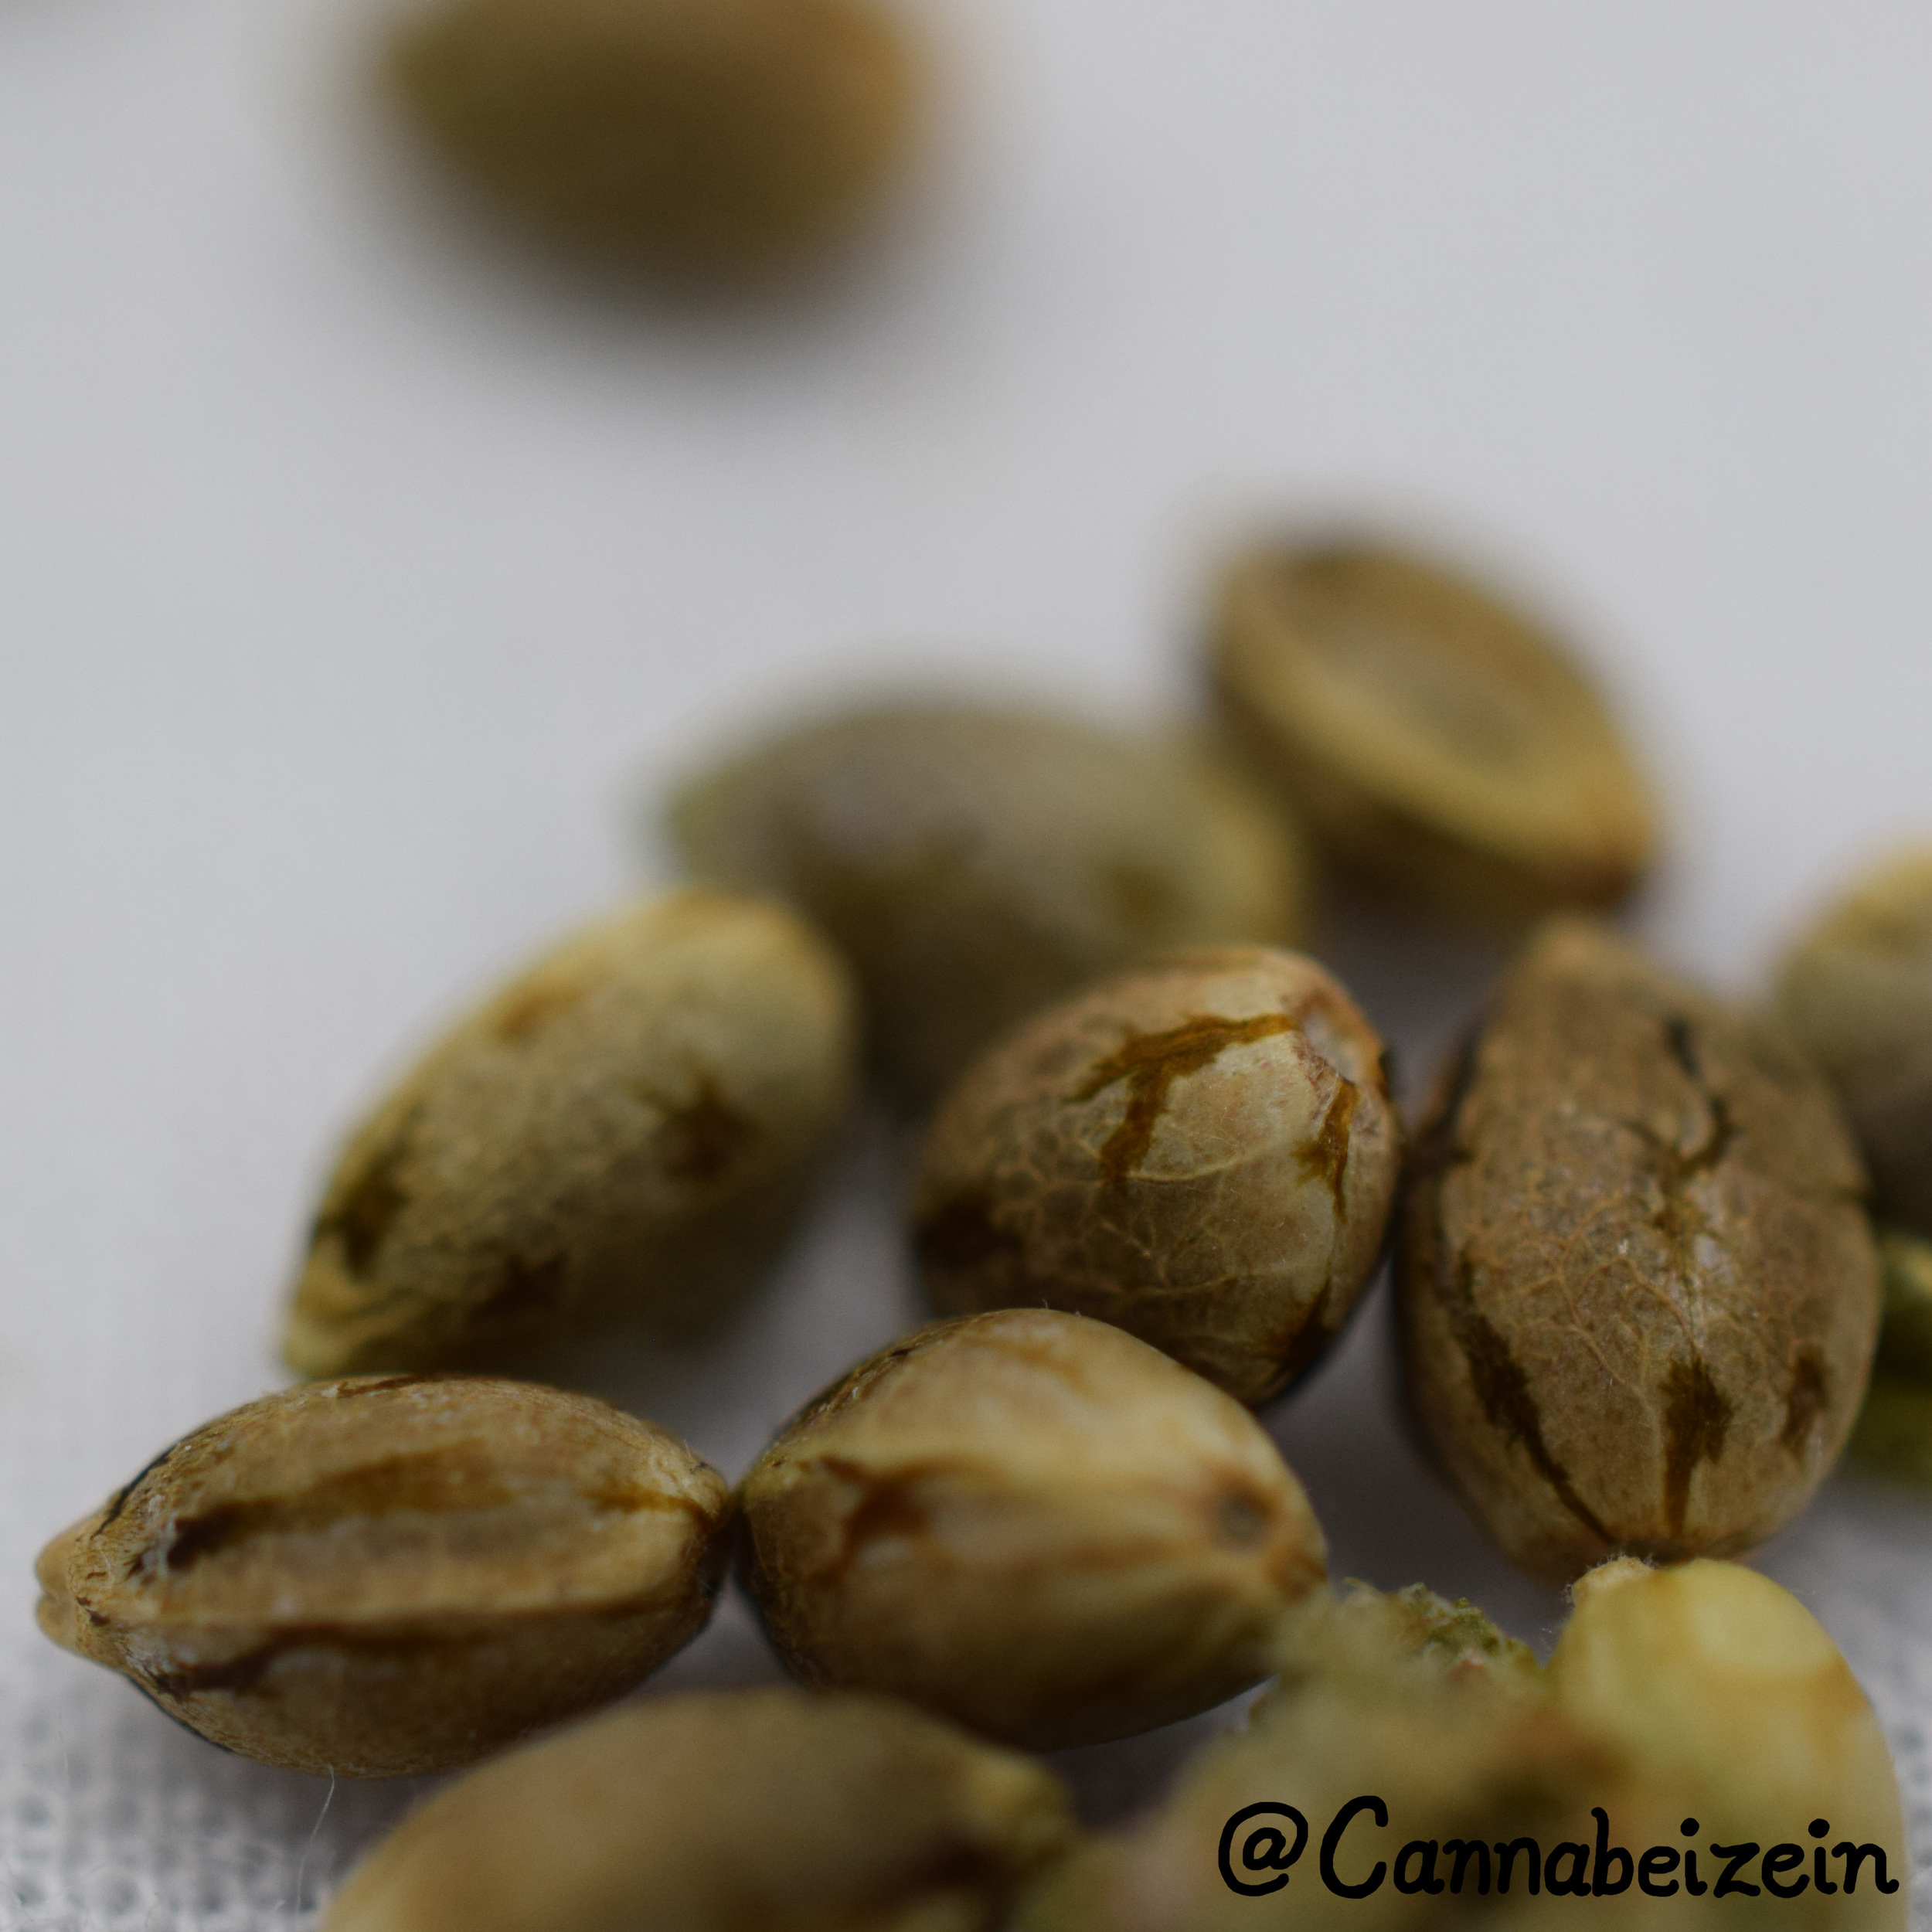 Cannabeizein 0215 - Mystery Mix Seeds - DSC_0790 copy.jpg